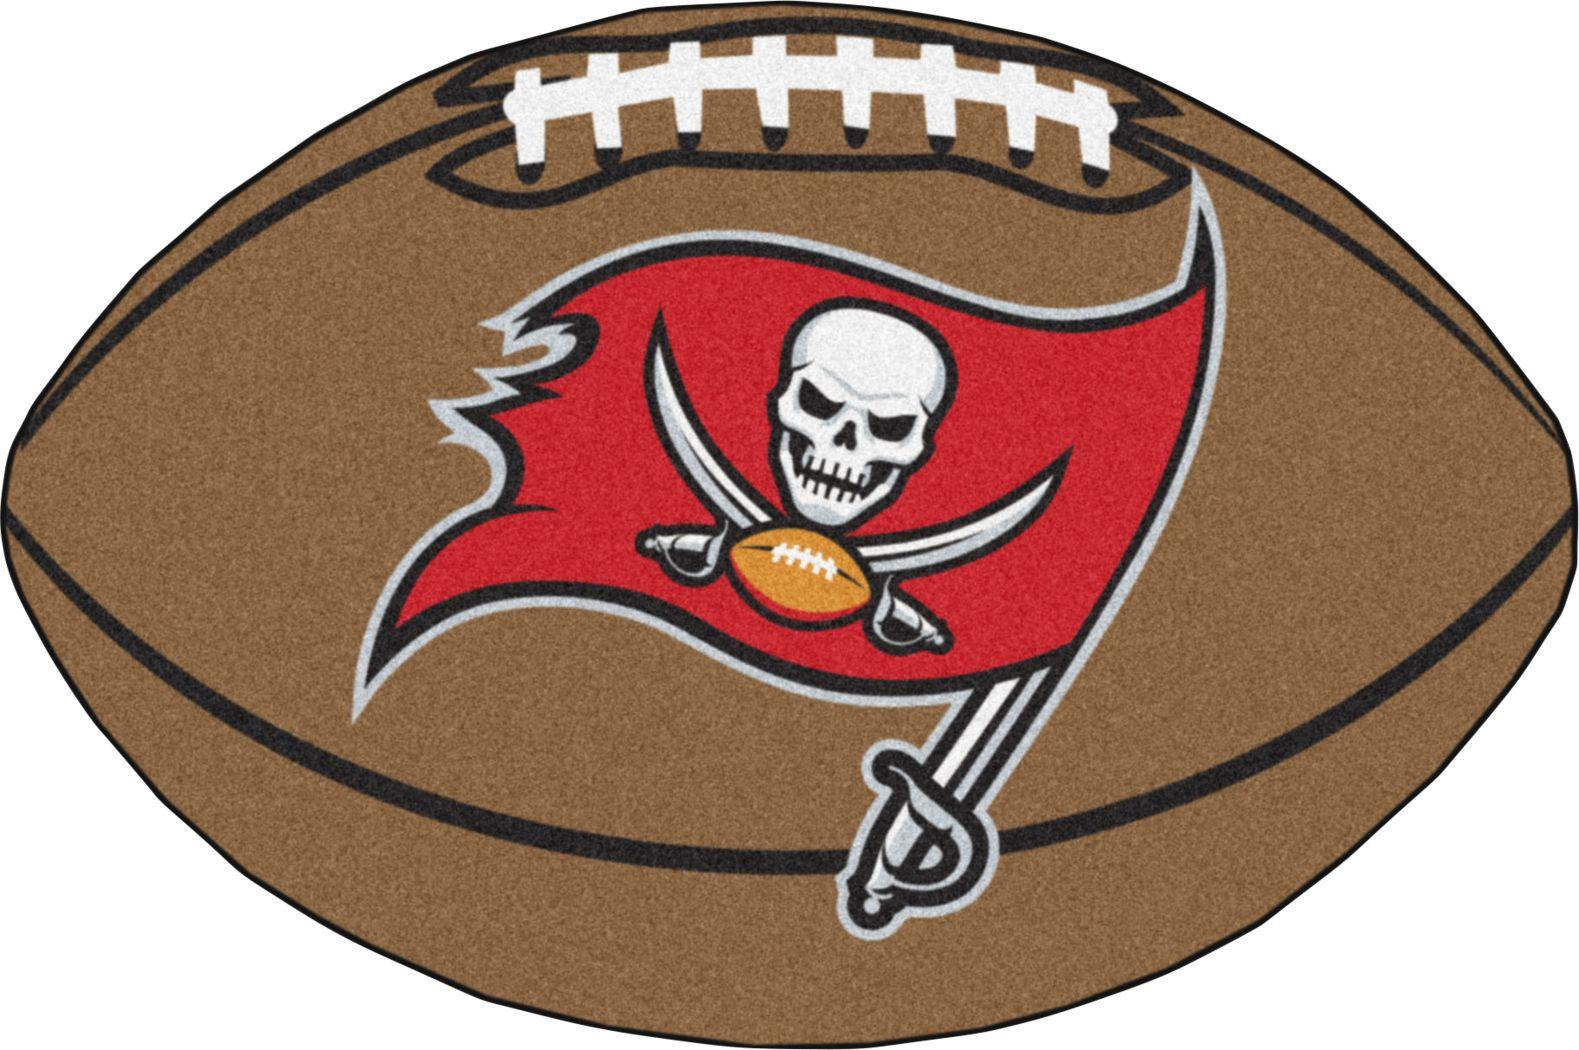 "NFL Football Mascot Tampa Bay Buccaneers 1'6"" x 1'10"" Rug"